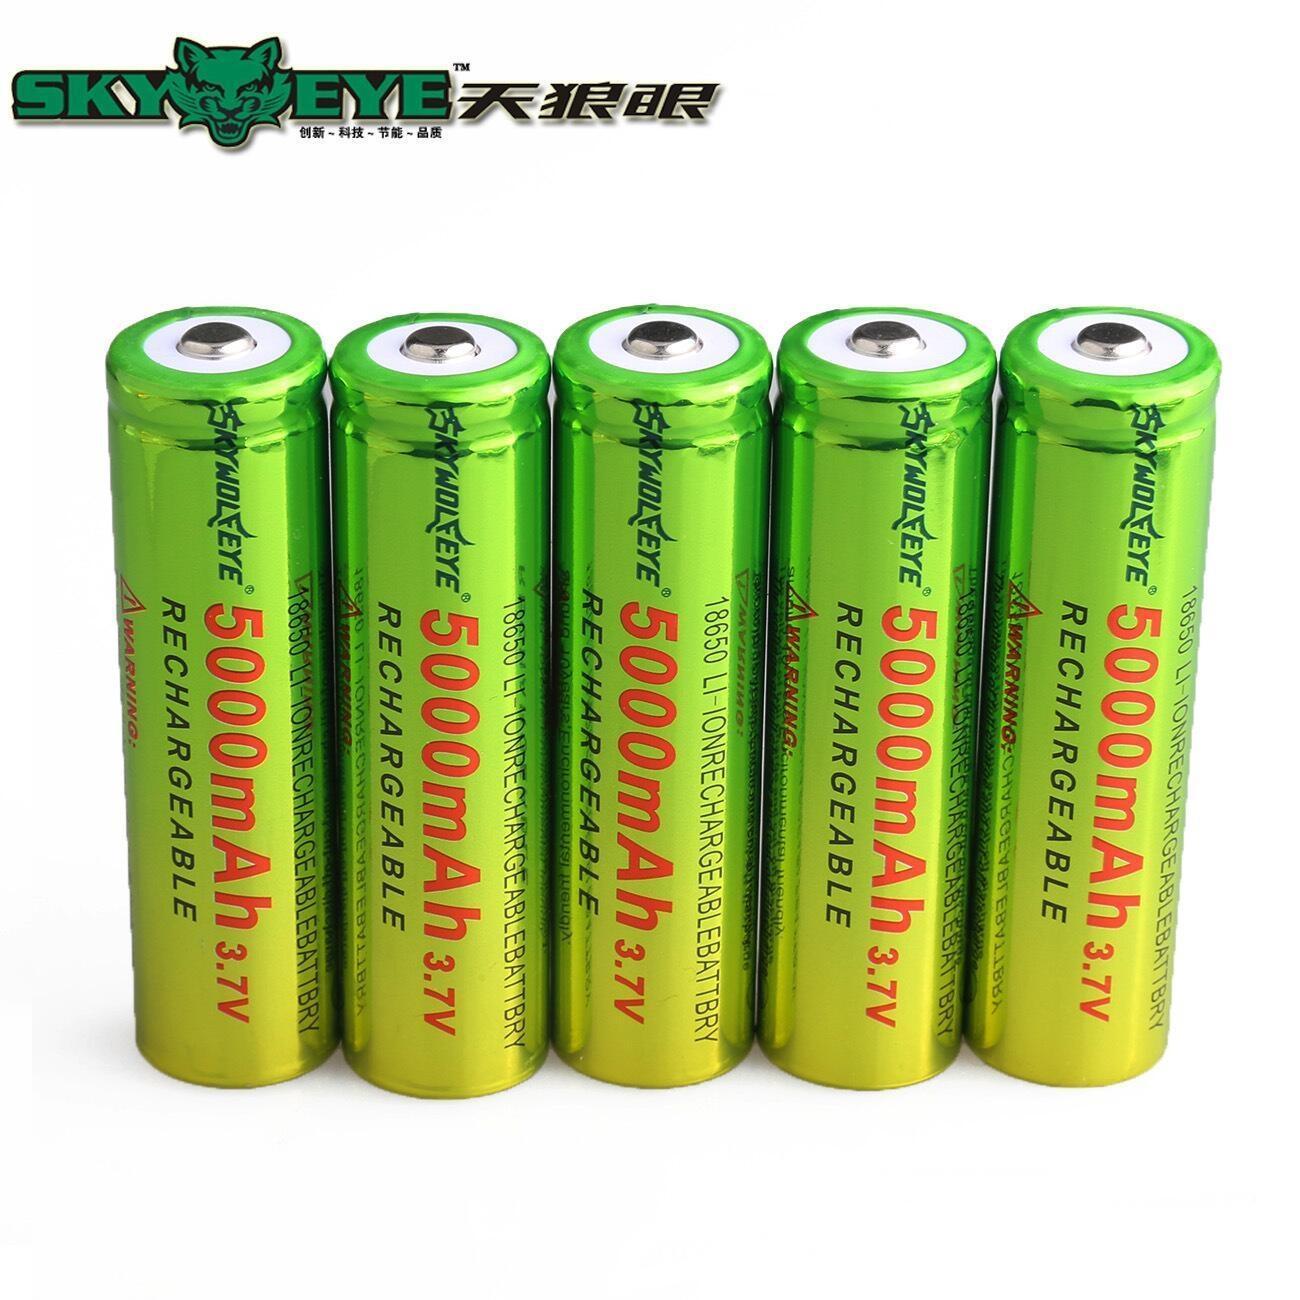 1 Pieces Li-ion 18650 5000mAh Rechargeable Batteries 3.7 V 18650 Lithium Battery Cells Replacement